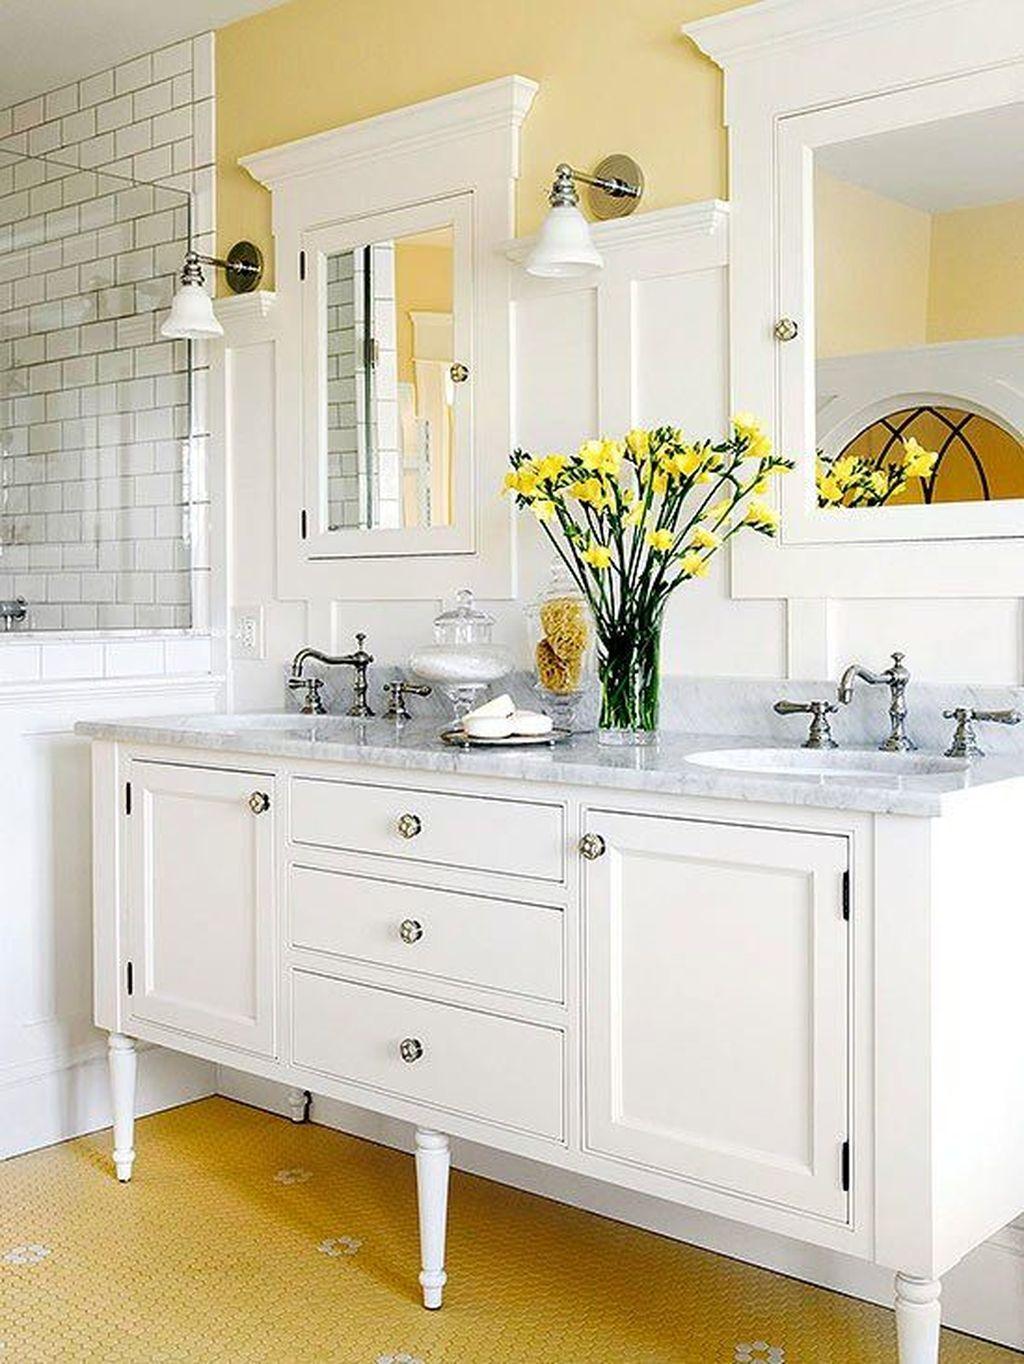 Creative Sunny Yellow Bathroom Decor For Summer 25